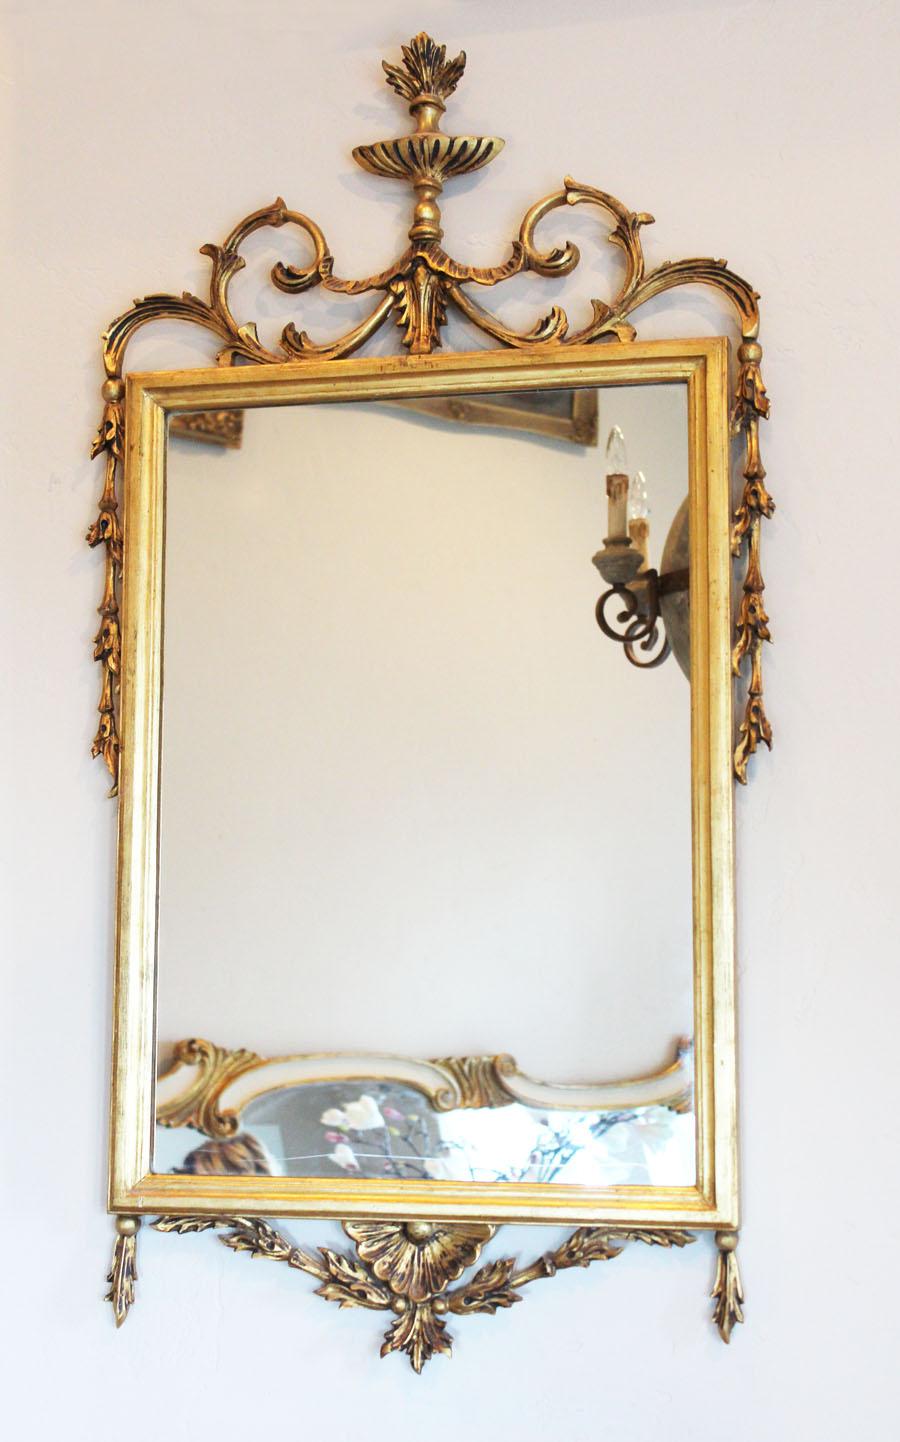 Antique Italian Florentine Palladio Carved Wood Mirror